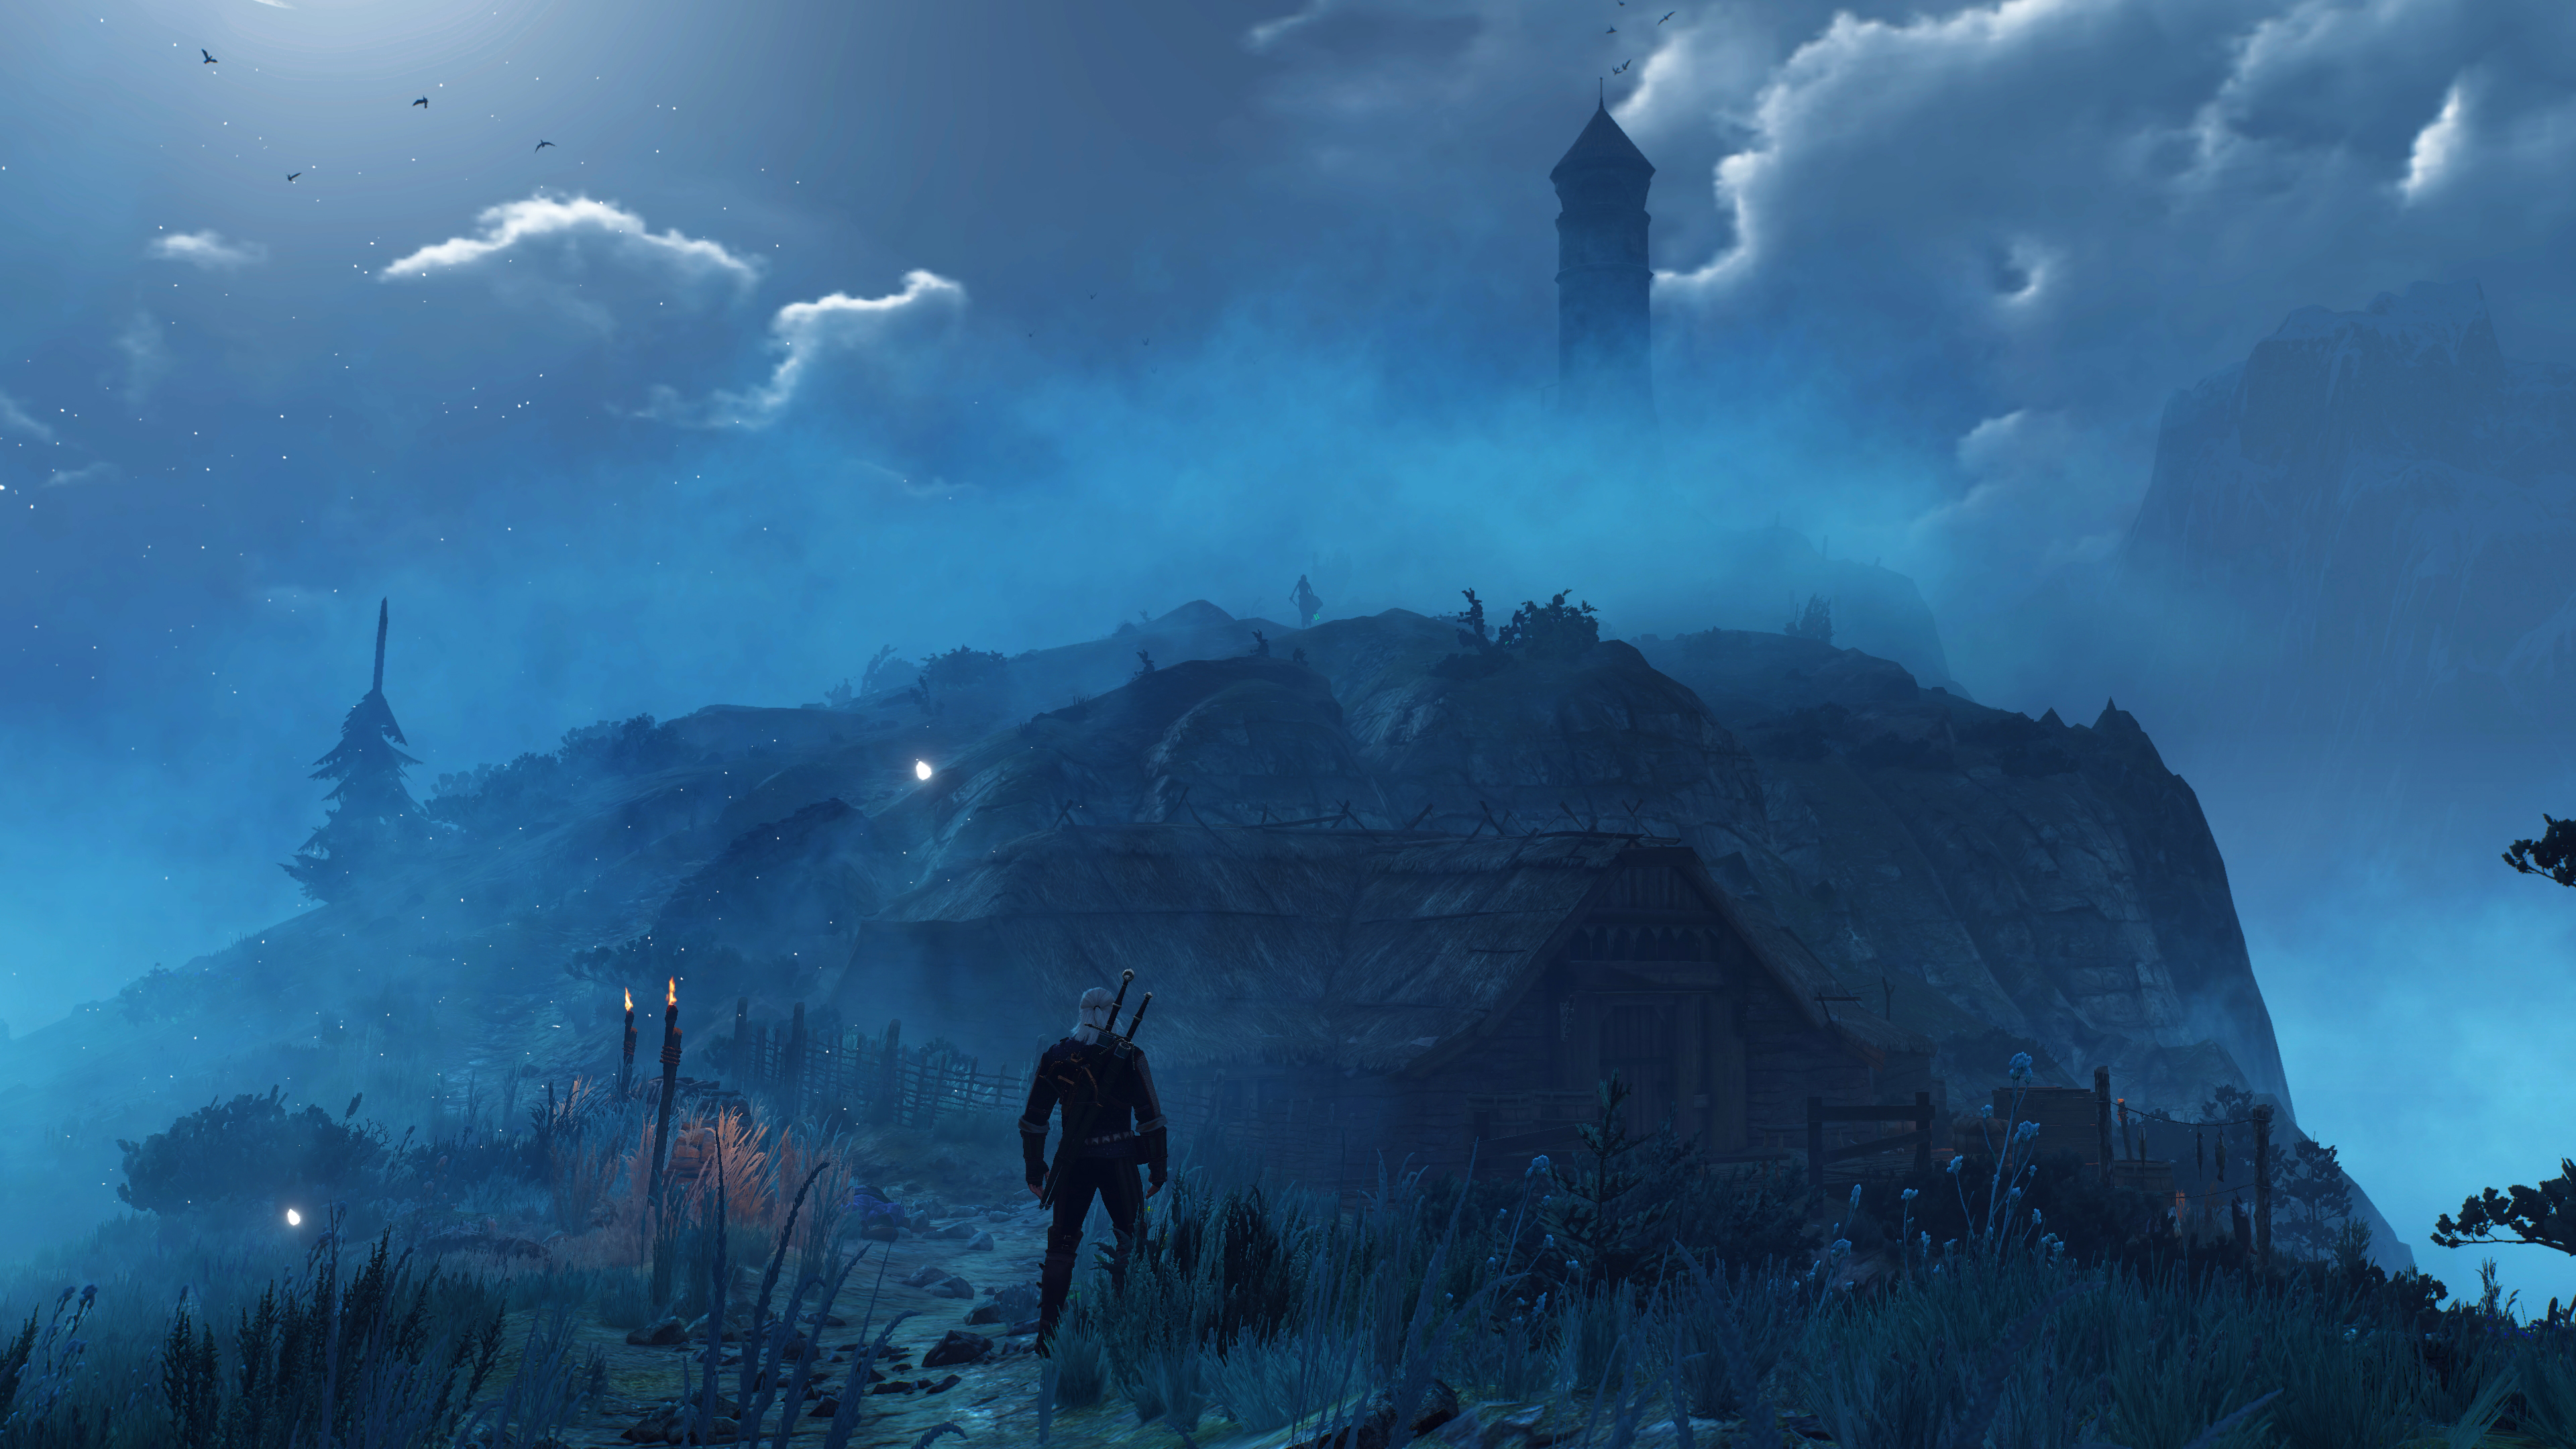 Виверна - Witcher 3: Wild Hunt, the